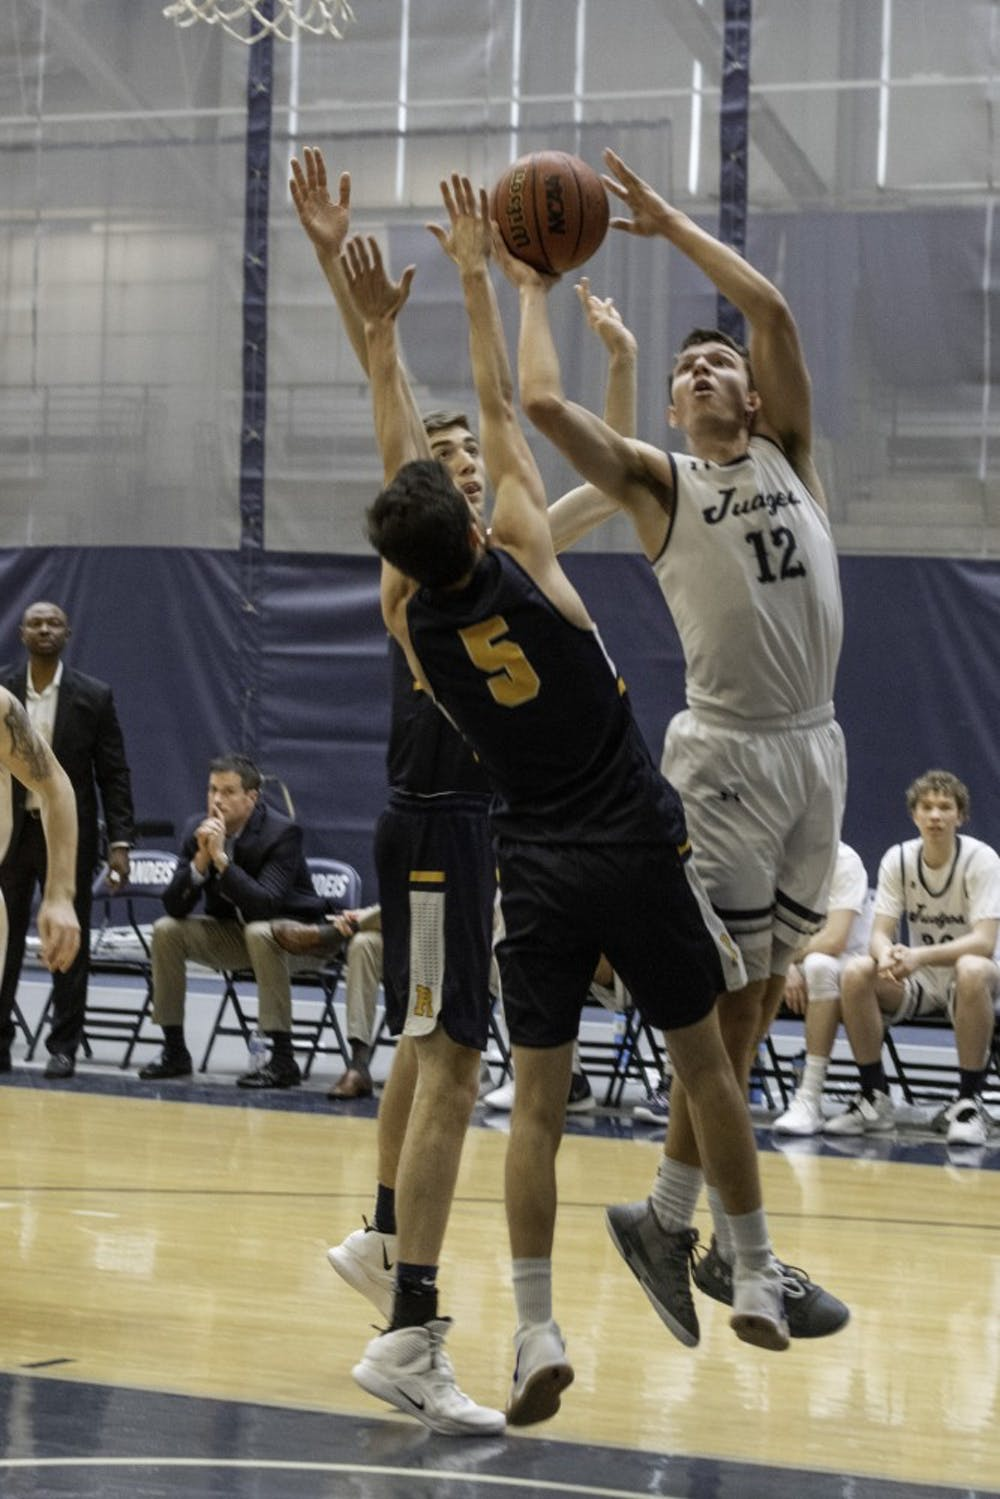 basketball-m-w-v-rochester-2-3-19-zb-0283